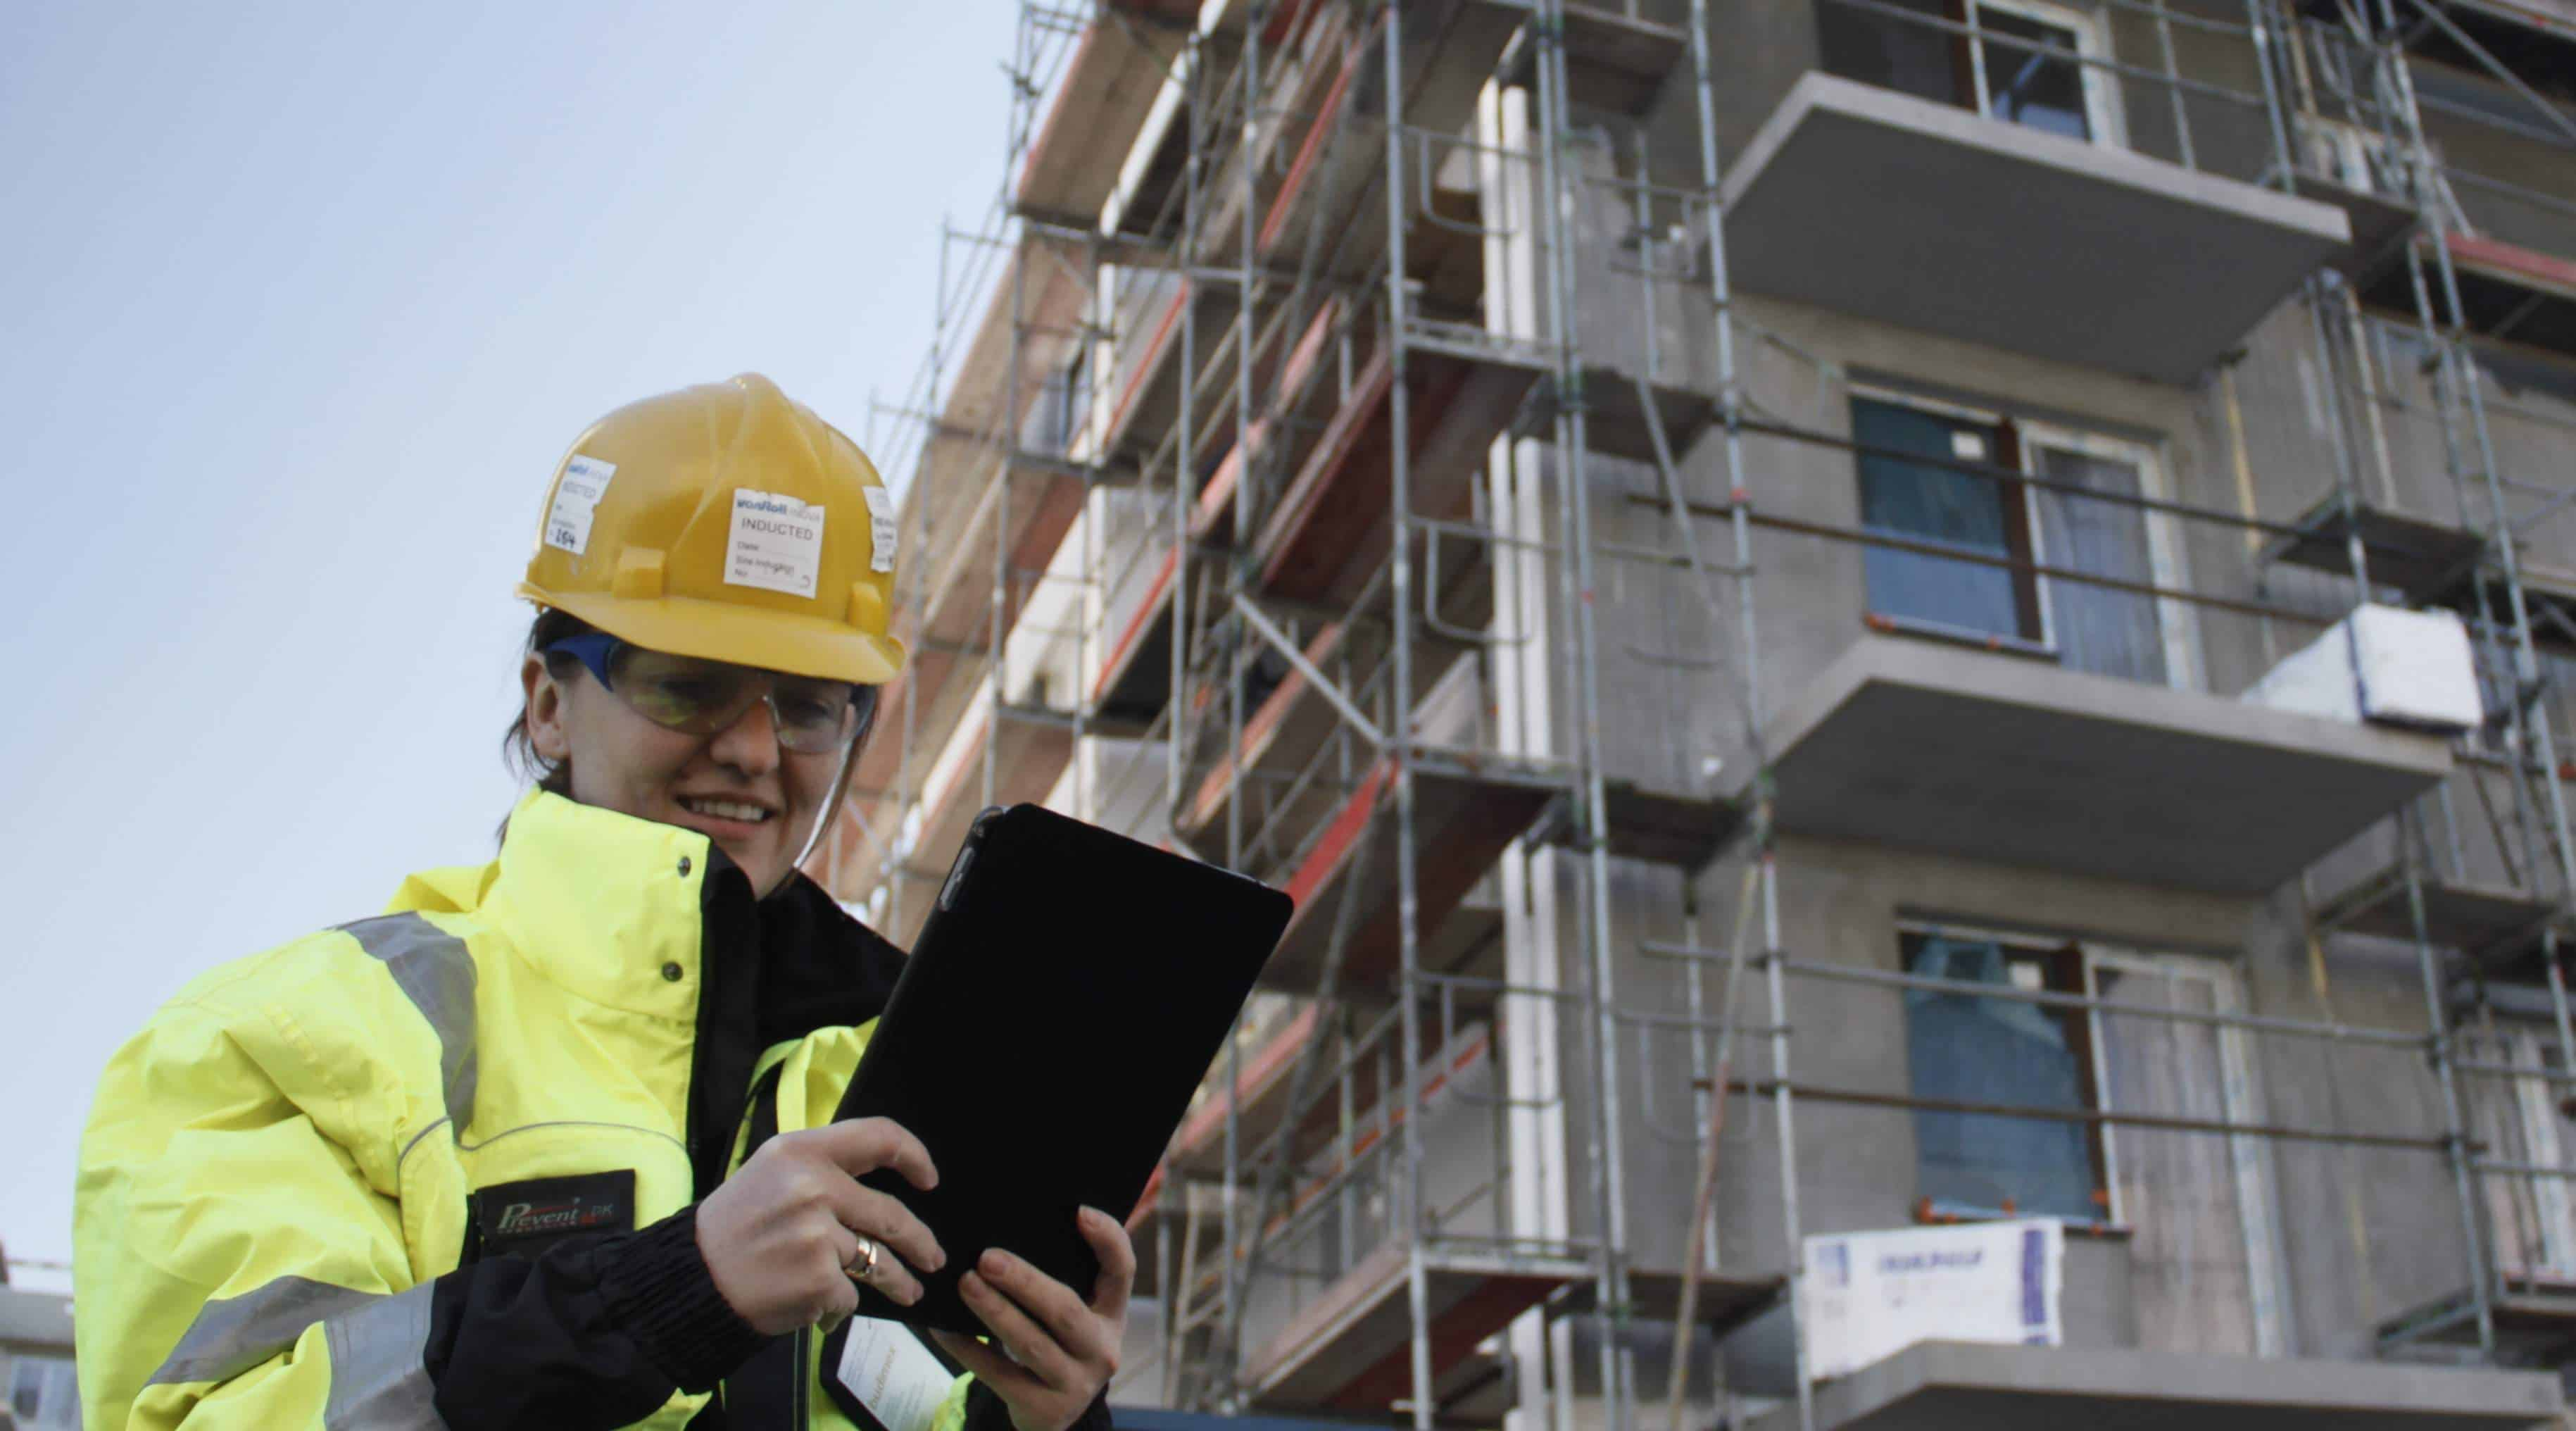 10 best construction app for 2018